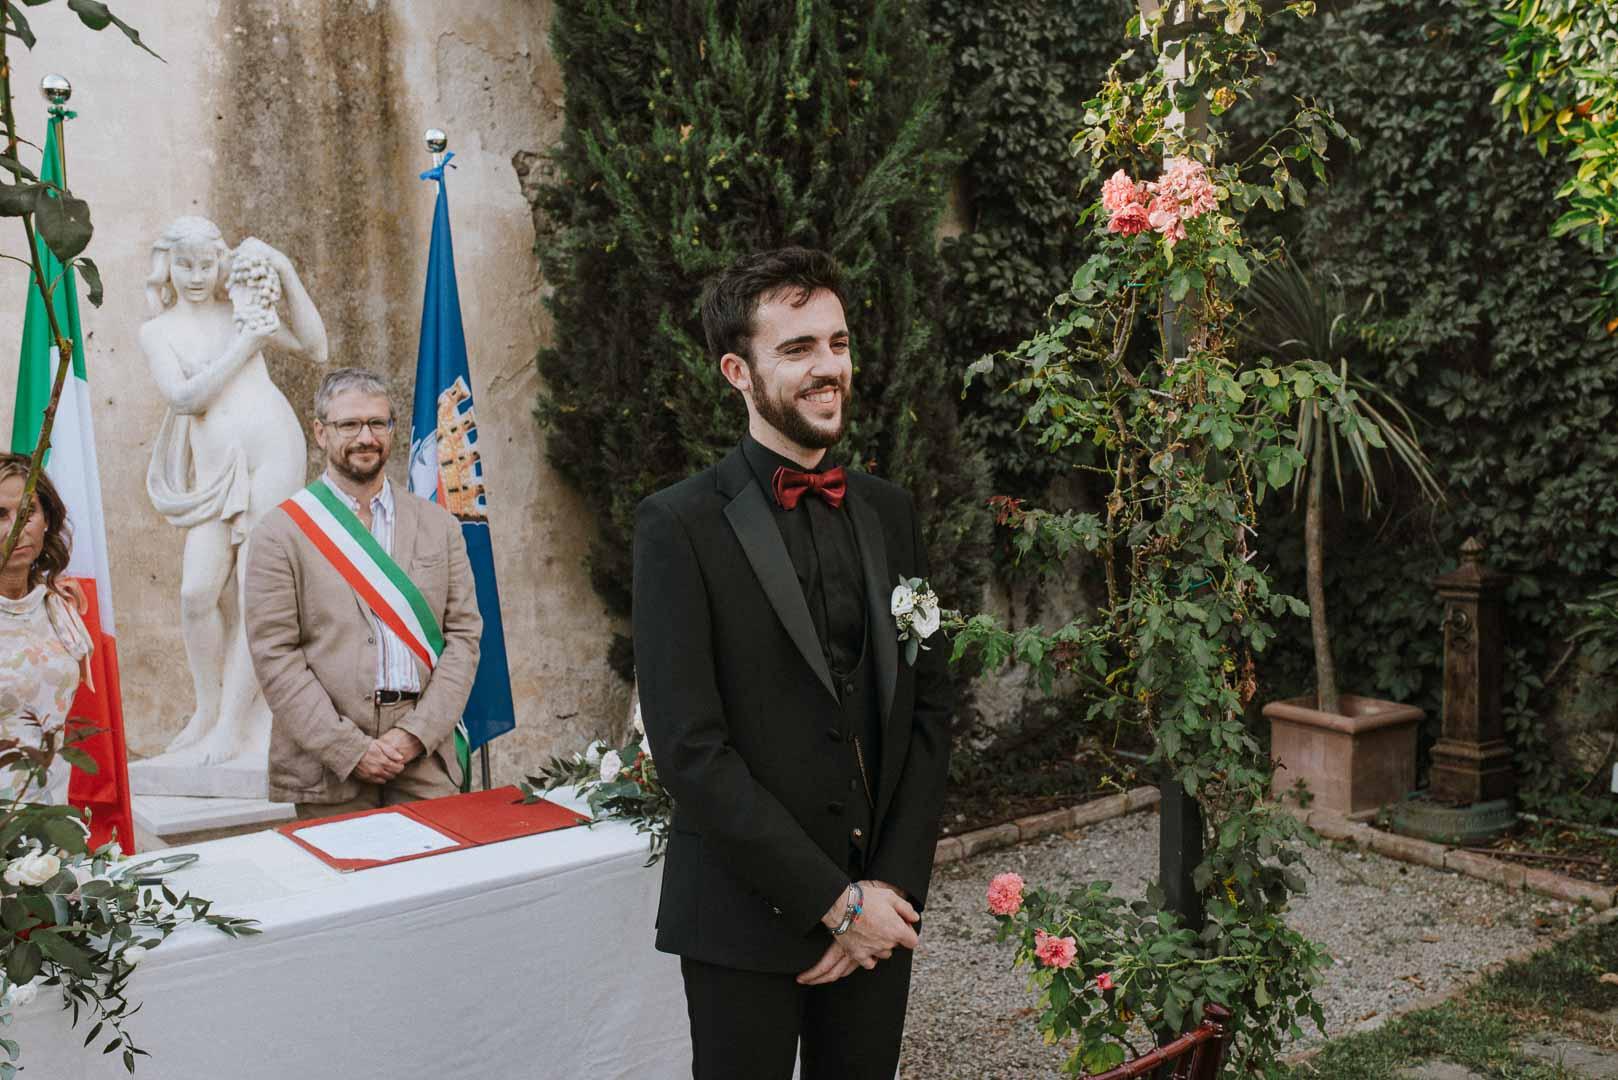 wedding-photographer-destination-fineart-bespoke-reportage-tuscany-villascorzi-vivianeizzo-spazio46-66